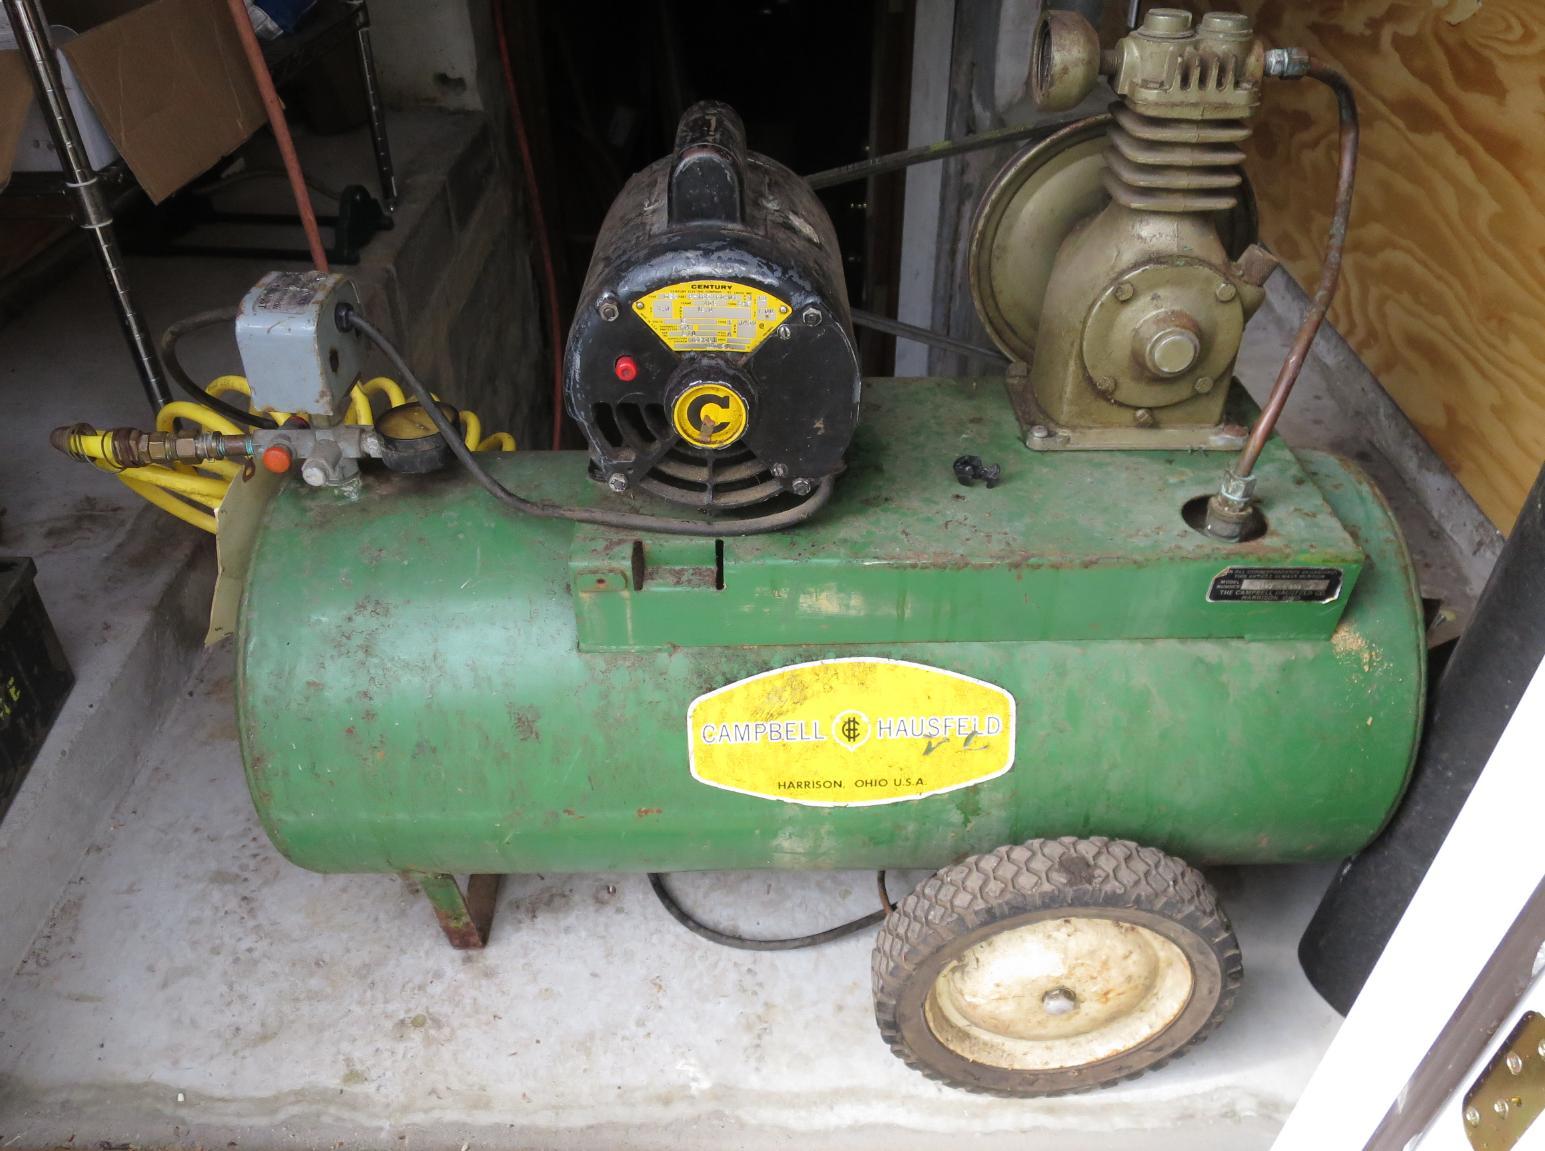 Vintage Campbell Hausfeld Air Compressor : Campbell hausfeld powerpal compressor pictures to pin on